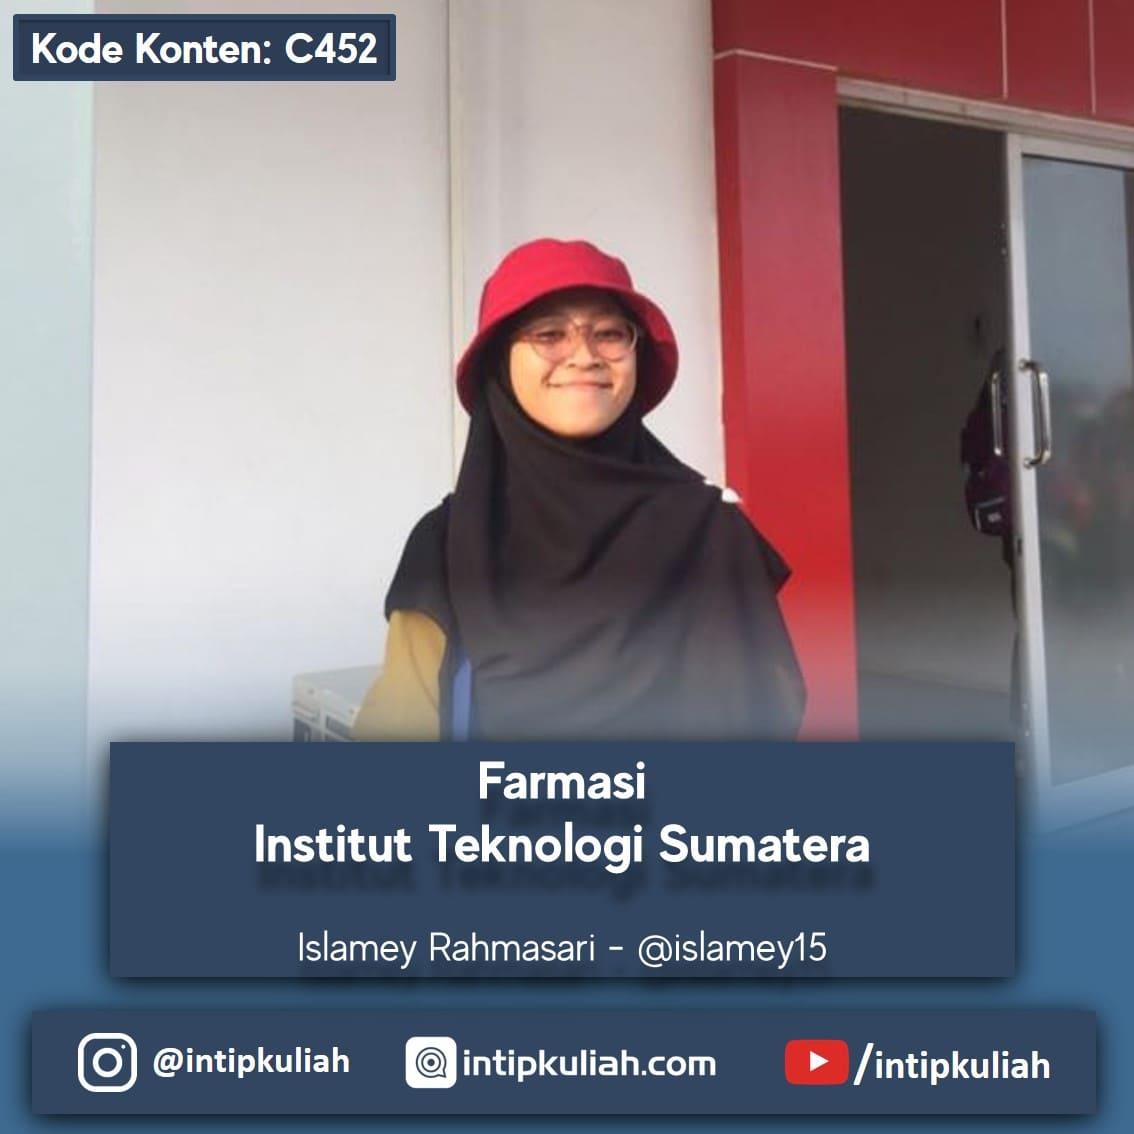 Farmasi Institut Teknologi Sumatera (Mey)